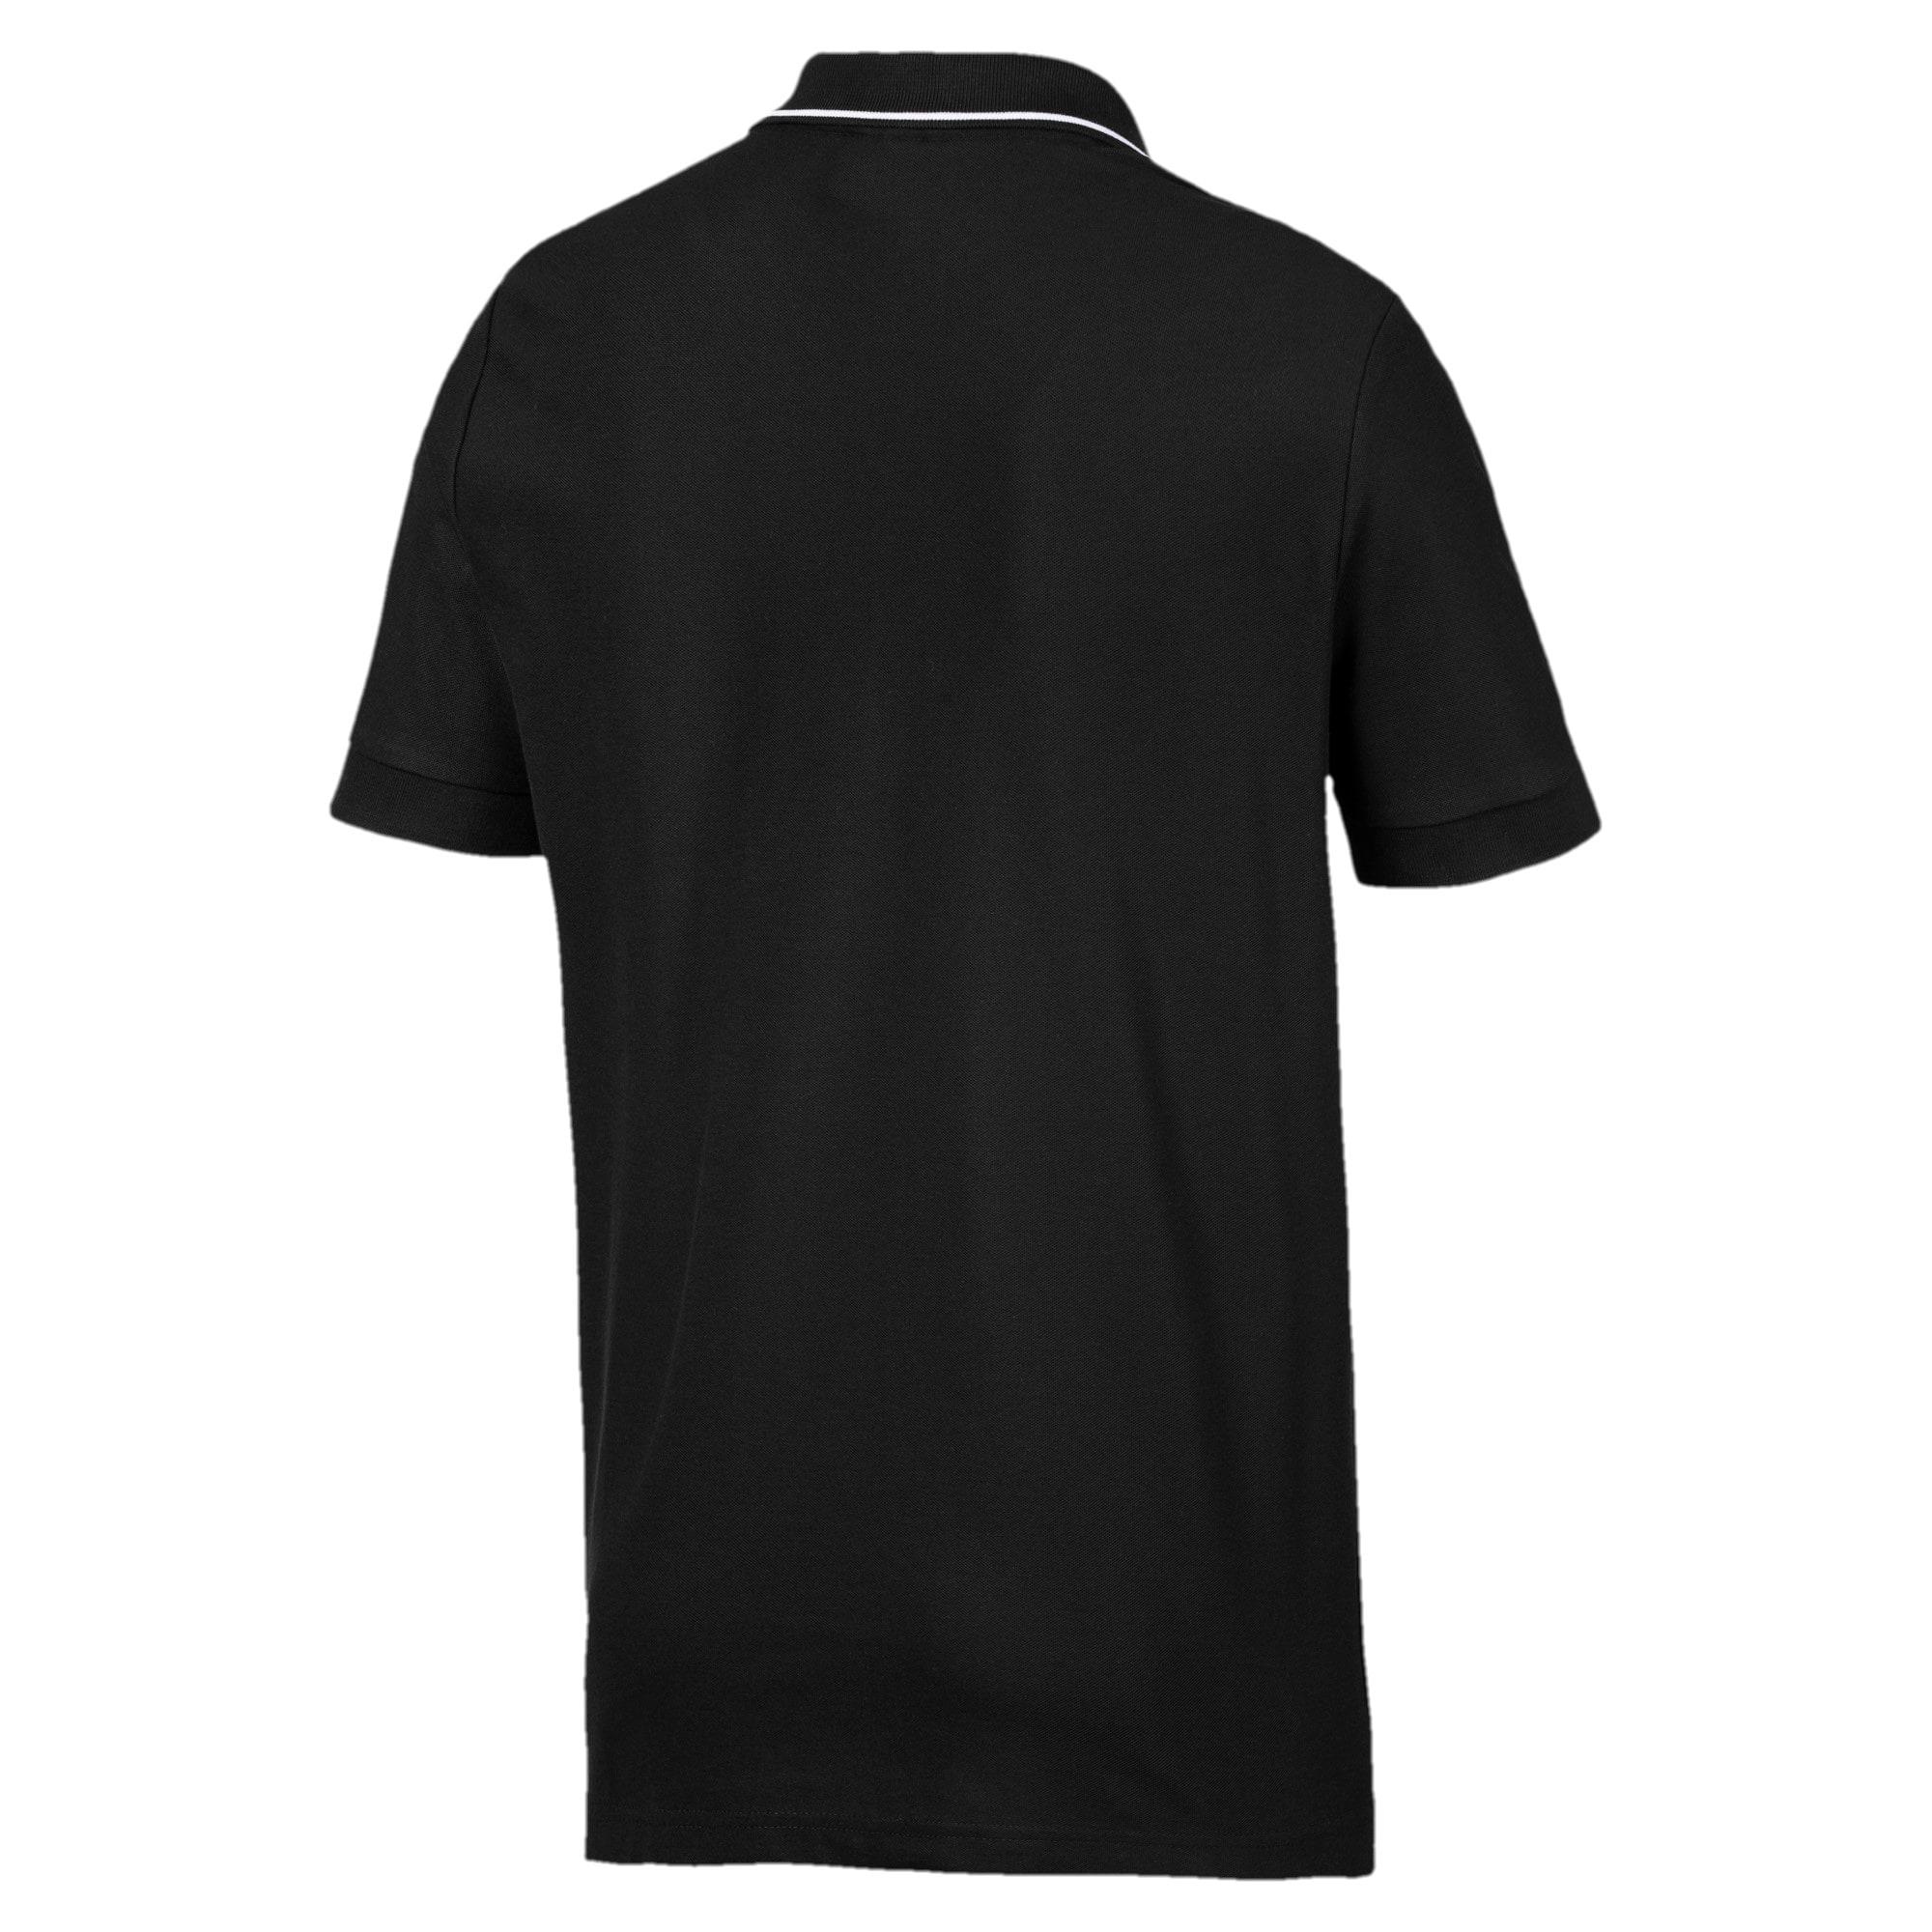 Miniatura 2 de Camiseta tipo polo Scuderia Ferrari para hombre, Puma Black, mediano